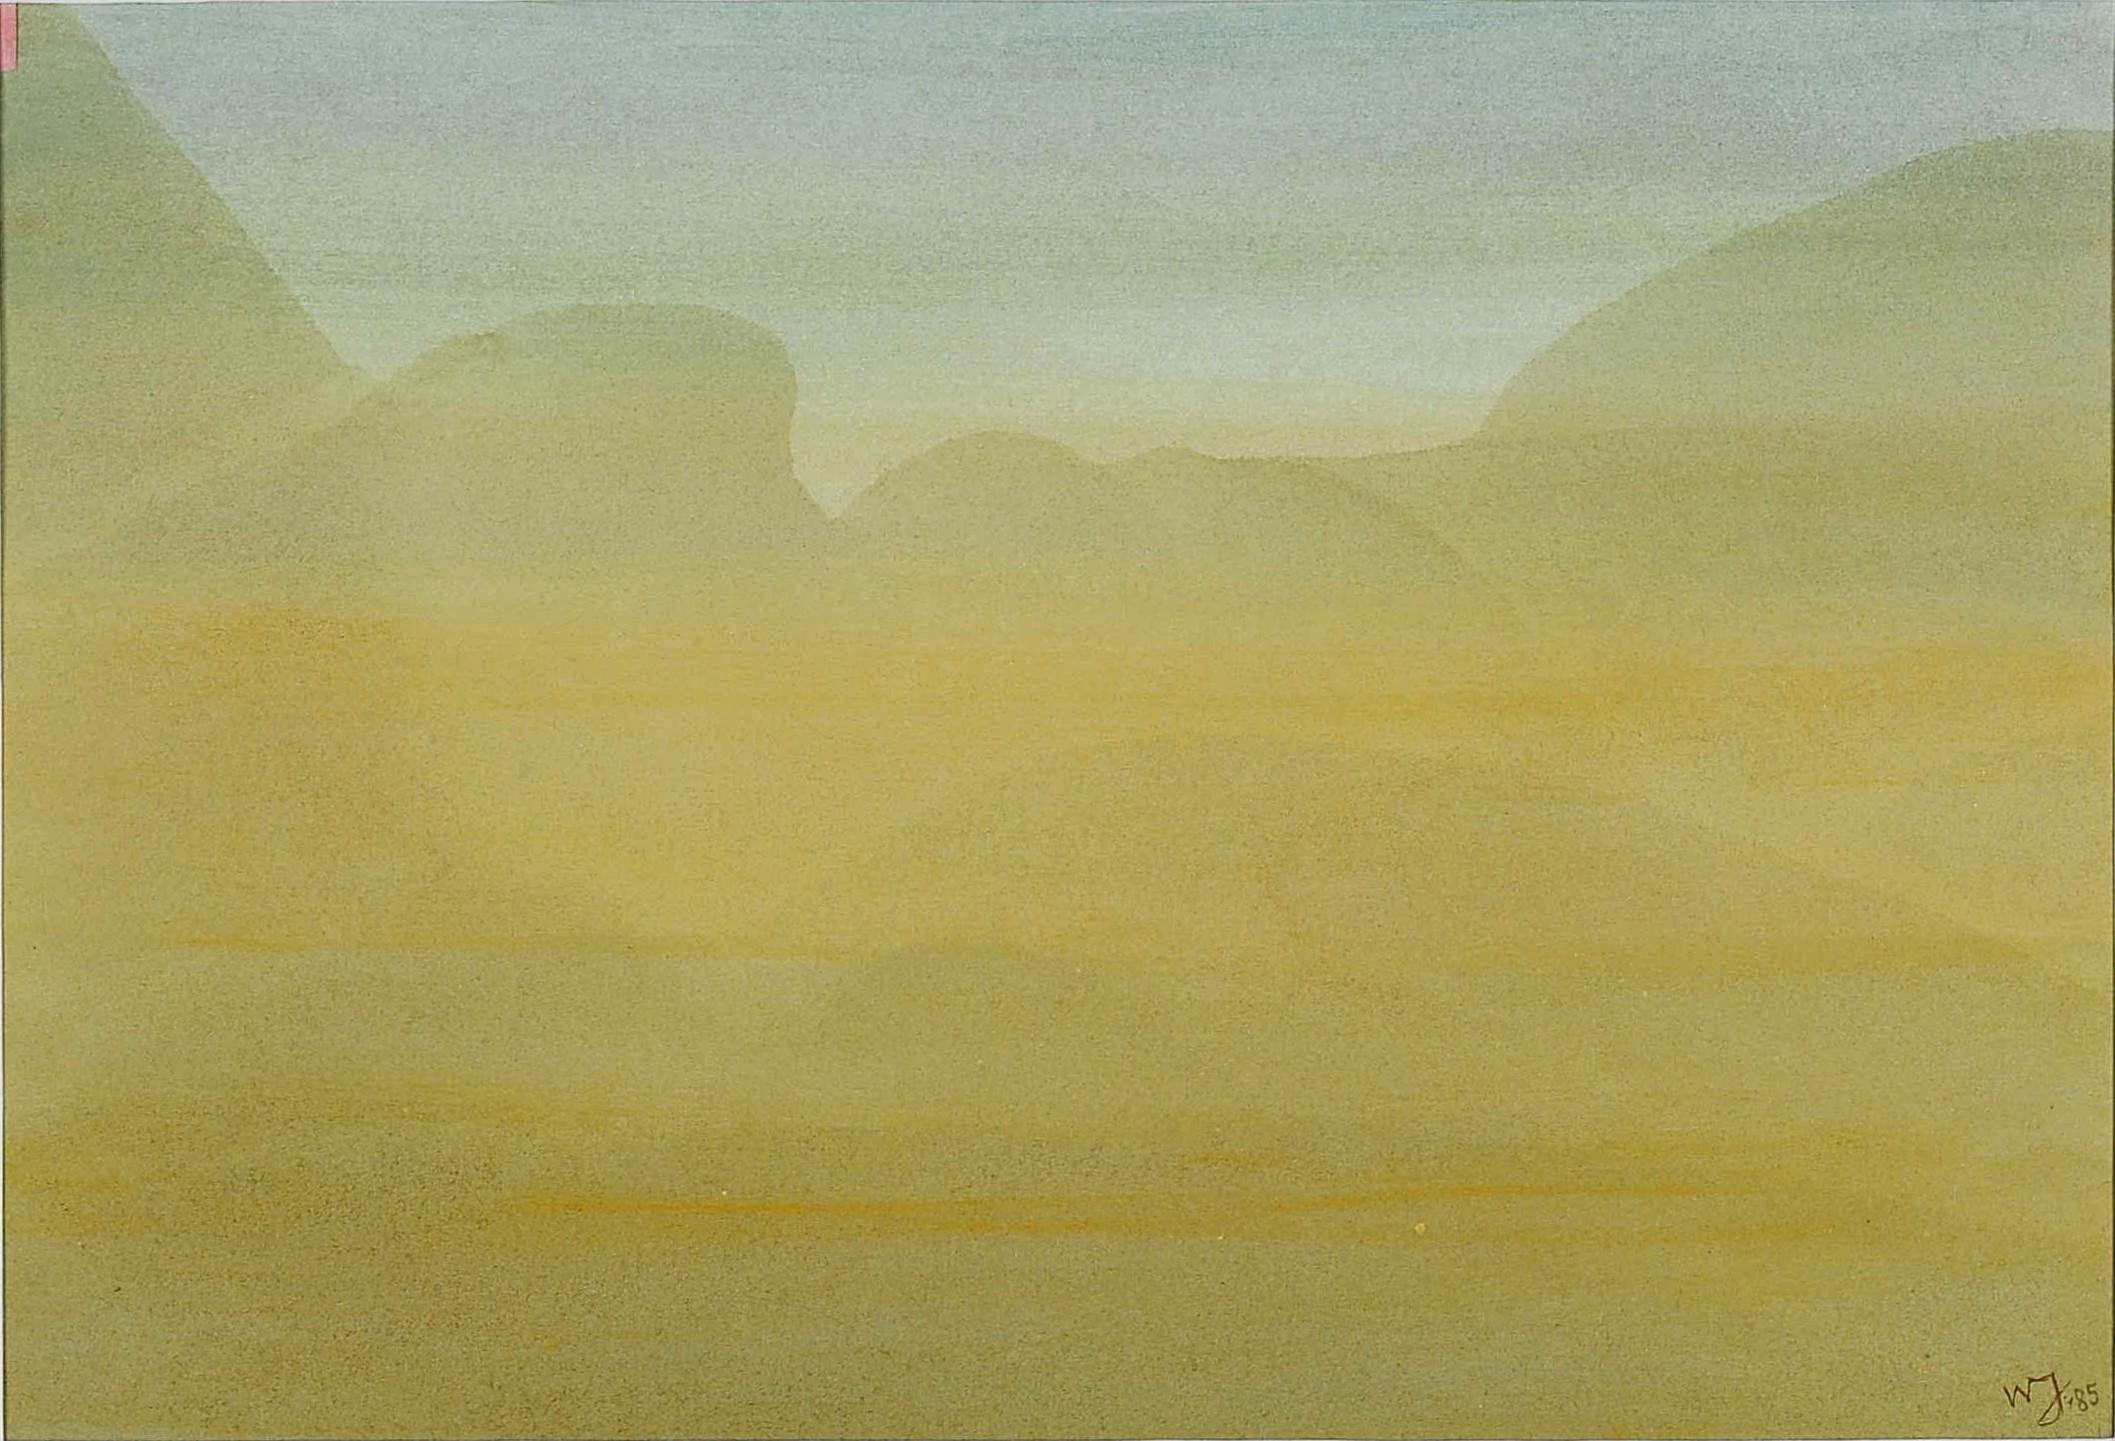 Nebel, 1985